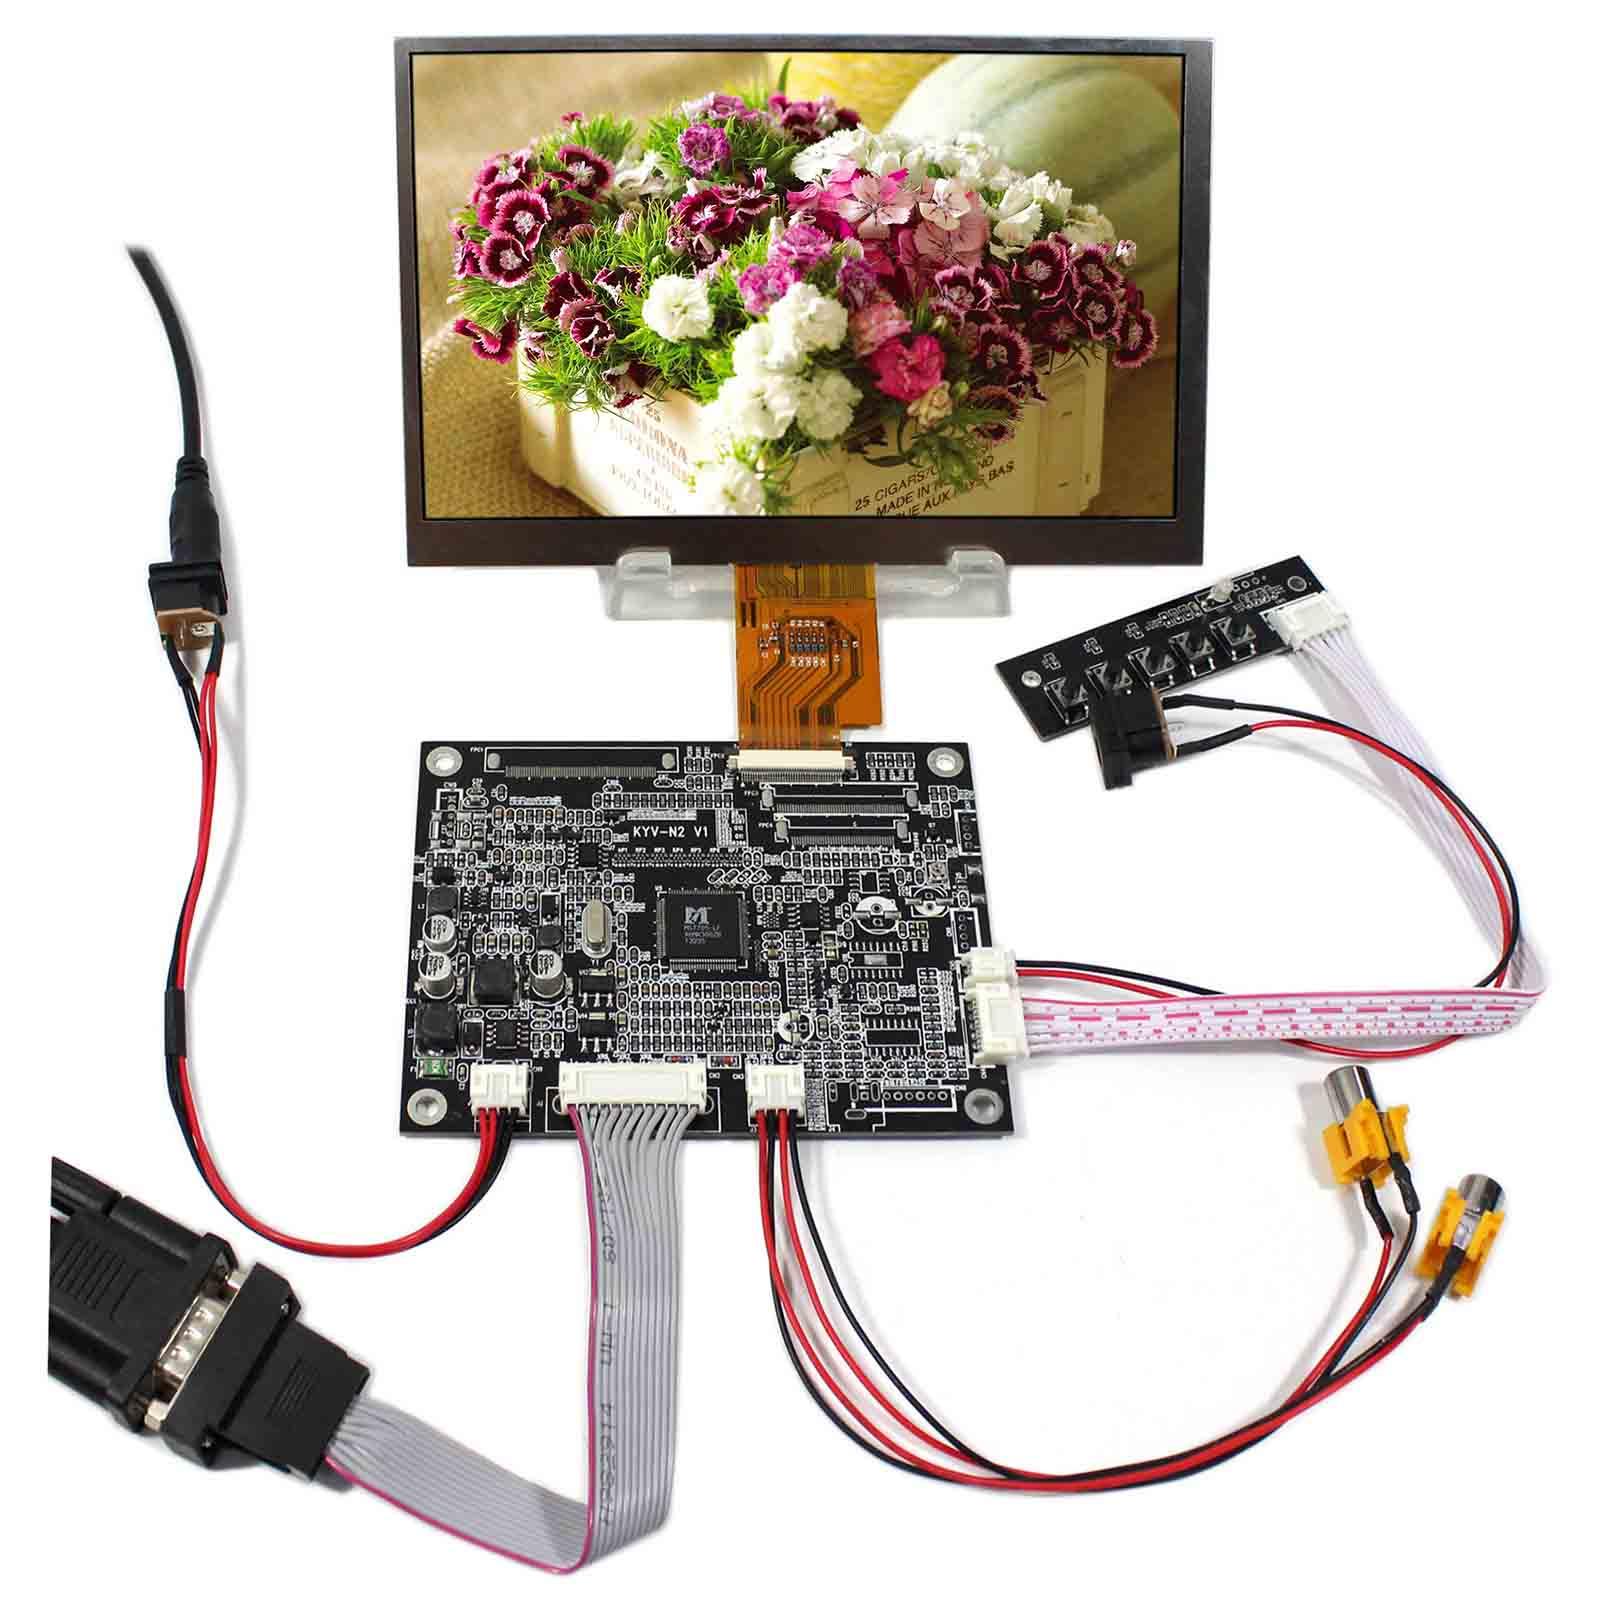 VGA+2AV Reversing LCD Controller Board With 7inch 1024x600 AT070TNA2 LCD Screen vga 2av reversing lcd controller board with 7inch 1024x600 at070tna2 lcd screen